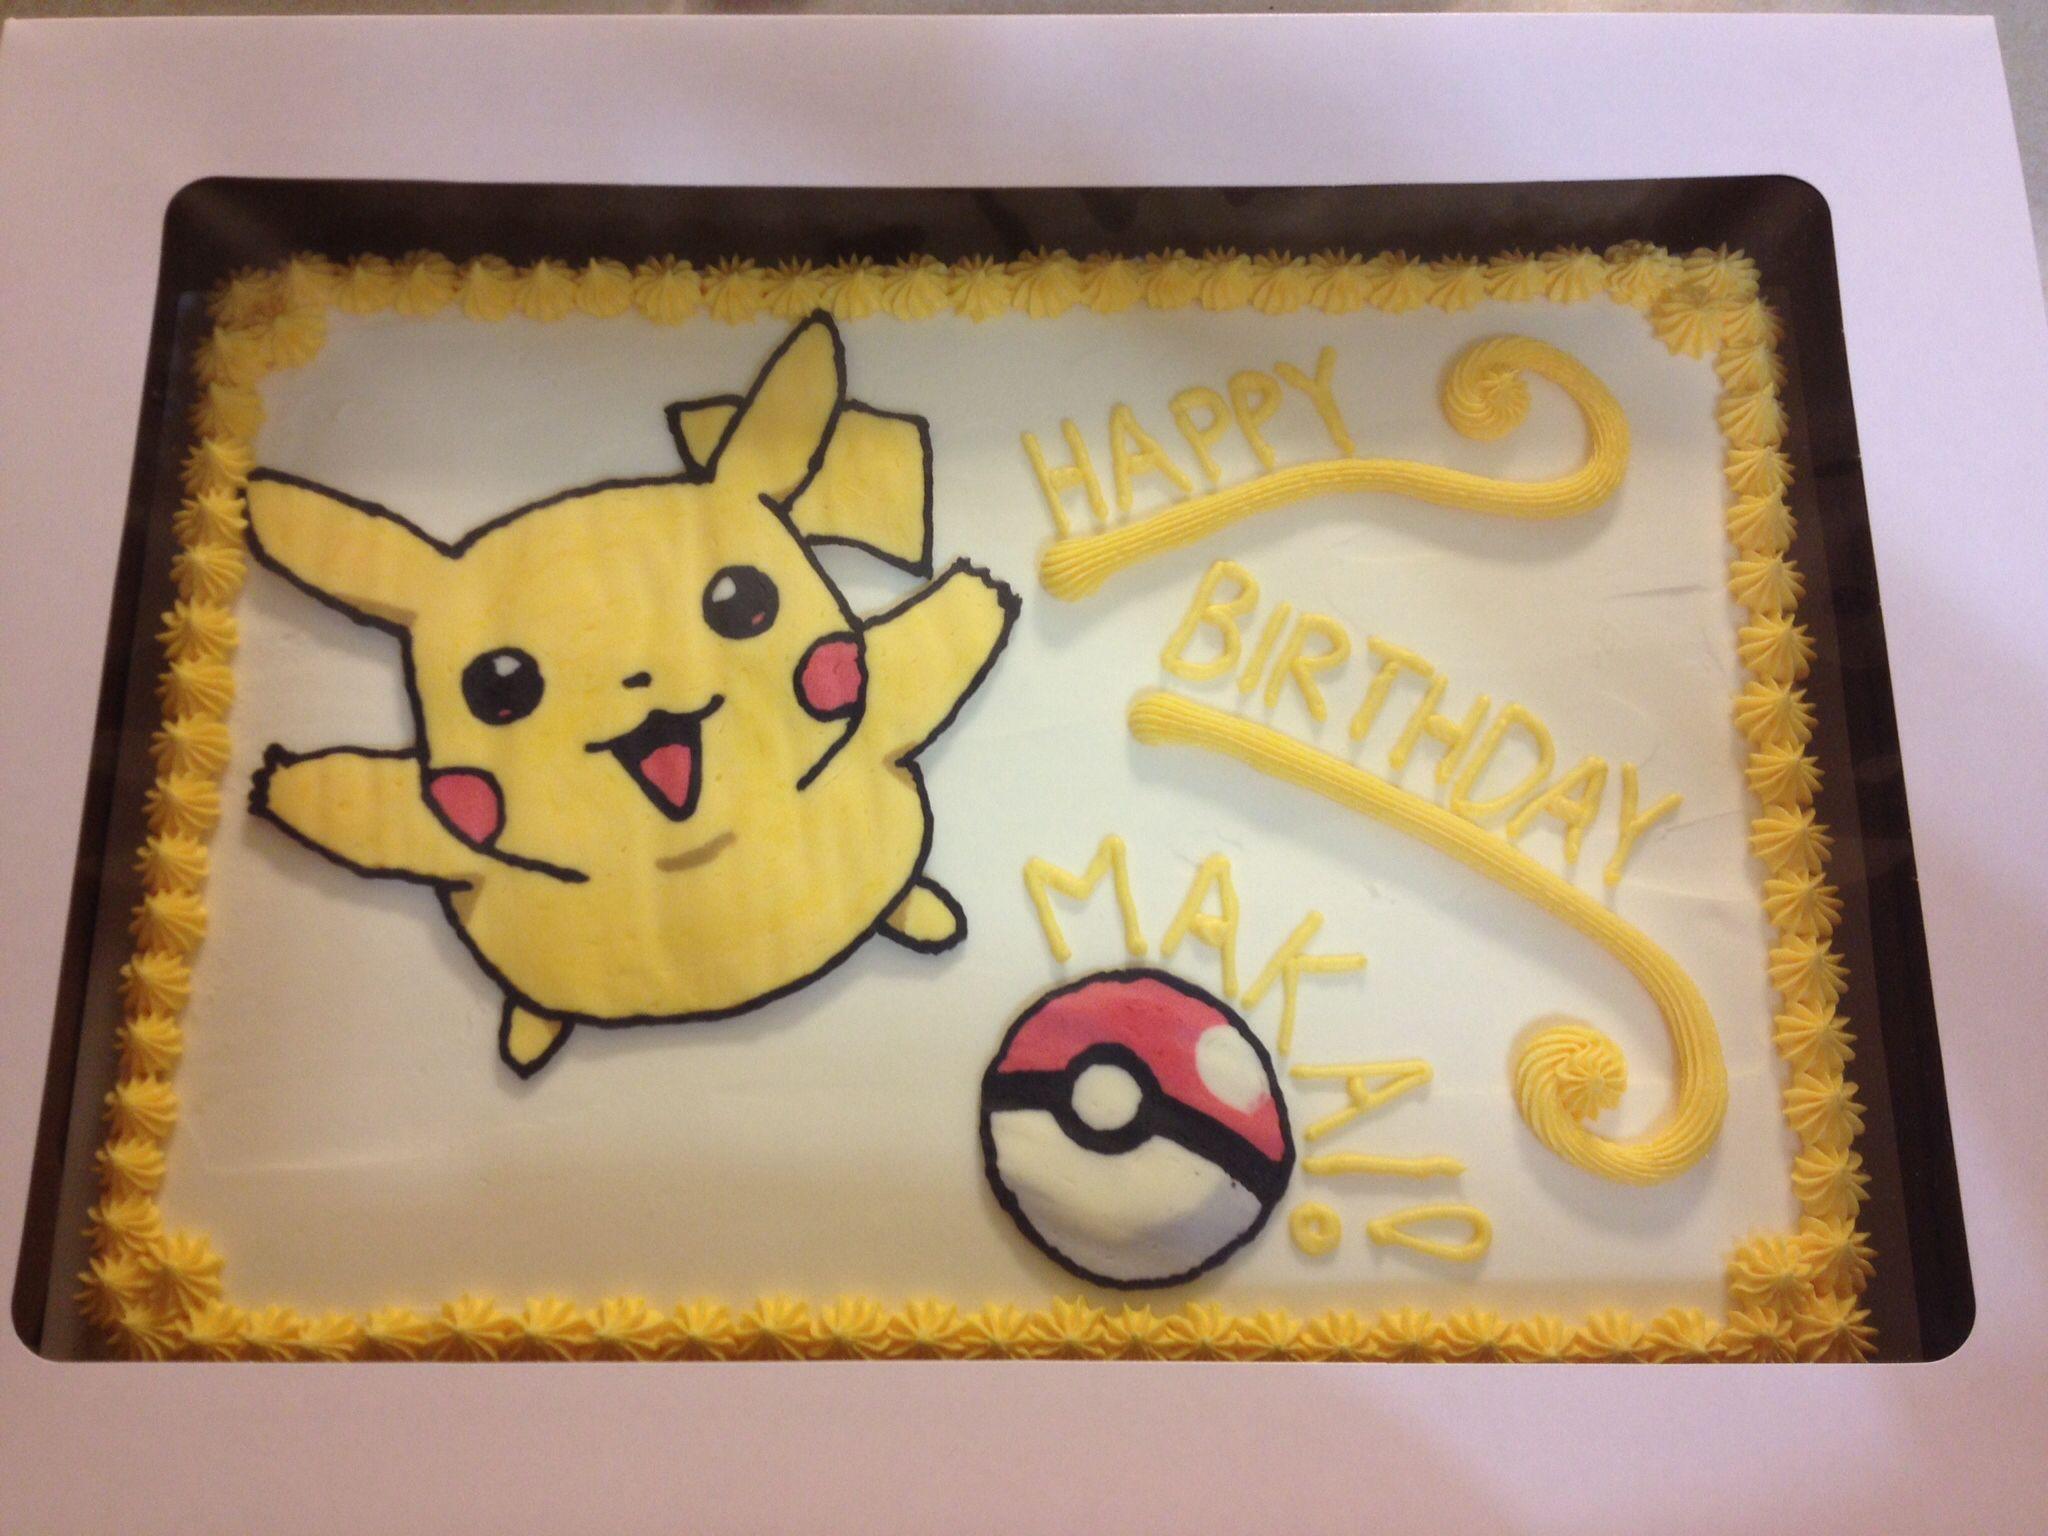 61 best Cakefully Cake images on Pinterest Birthday party ideas